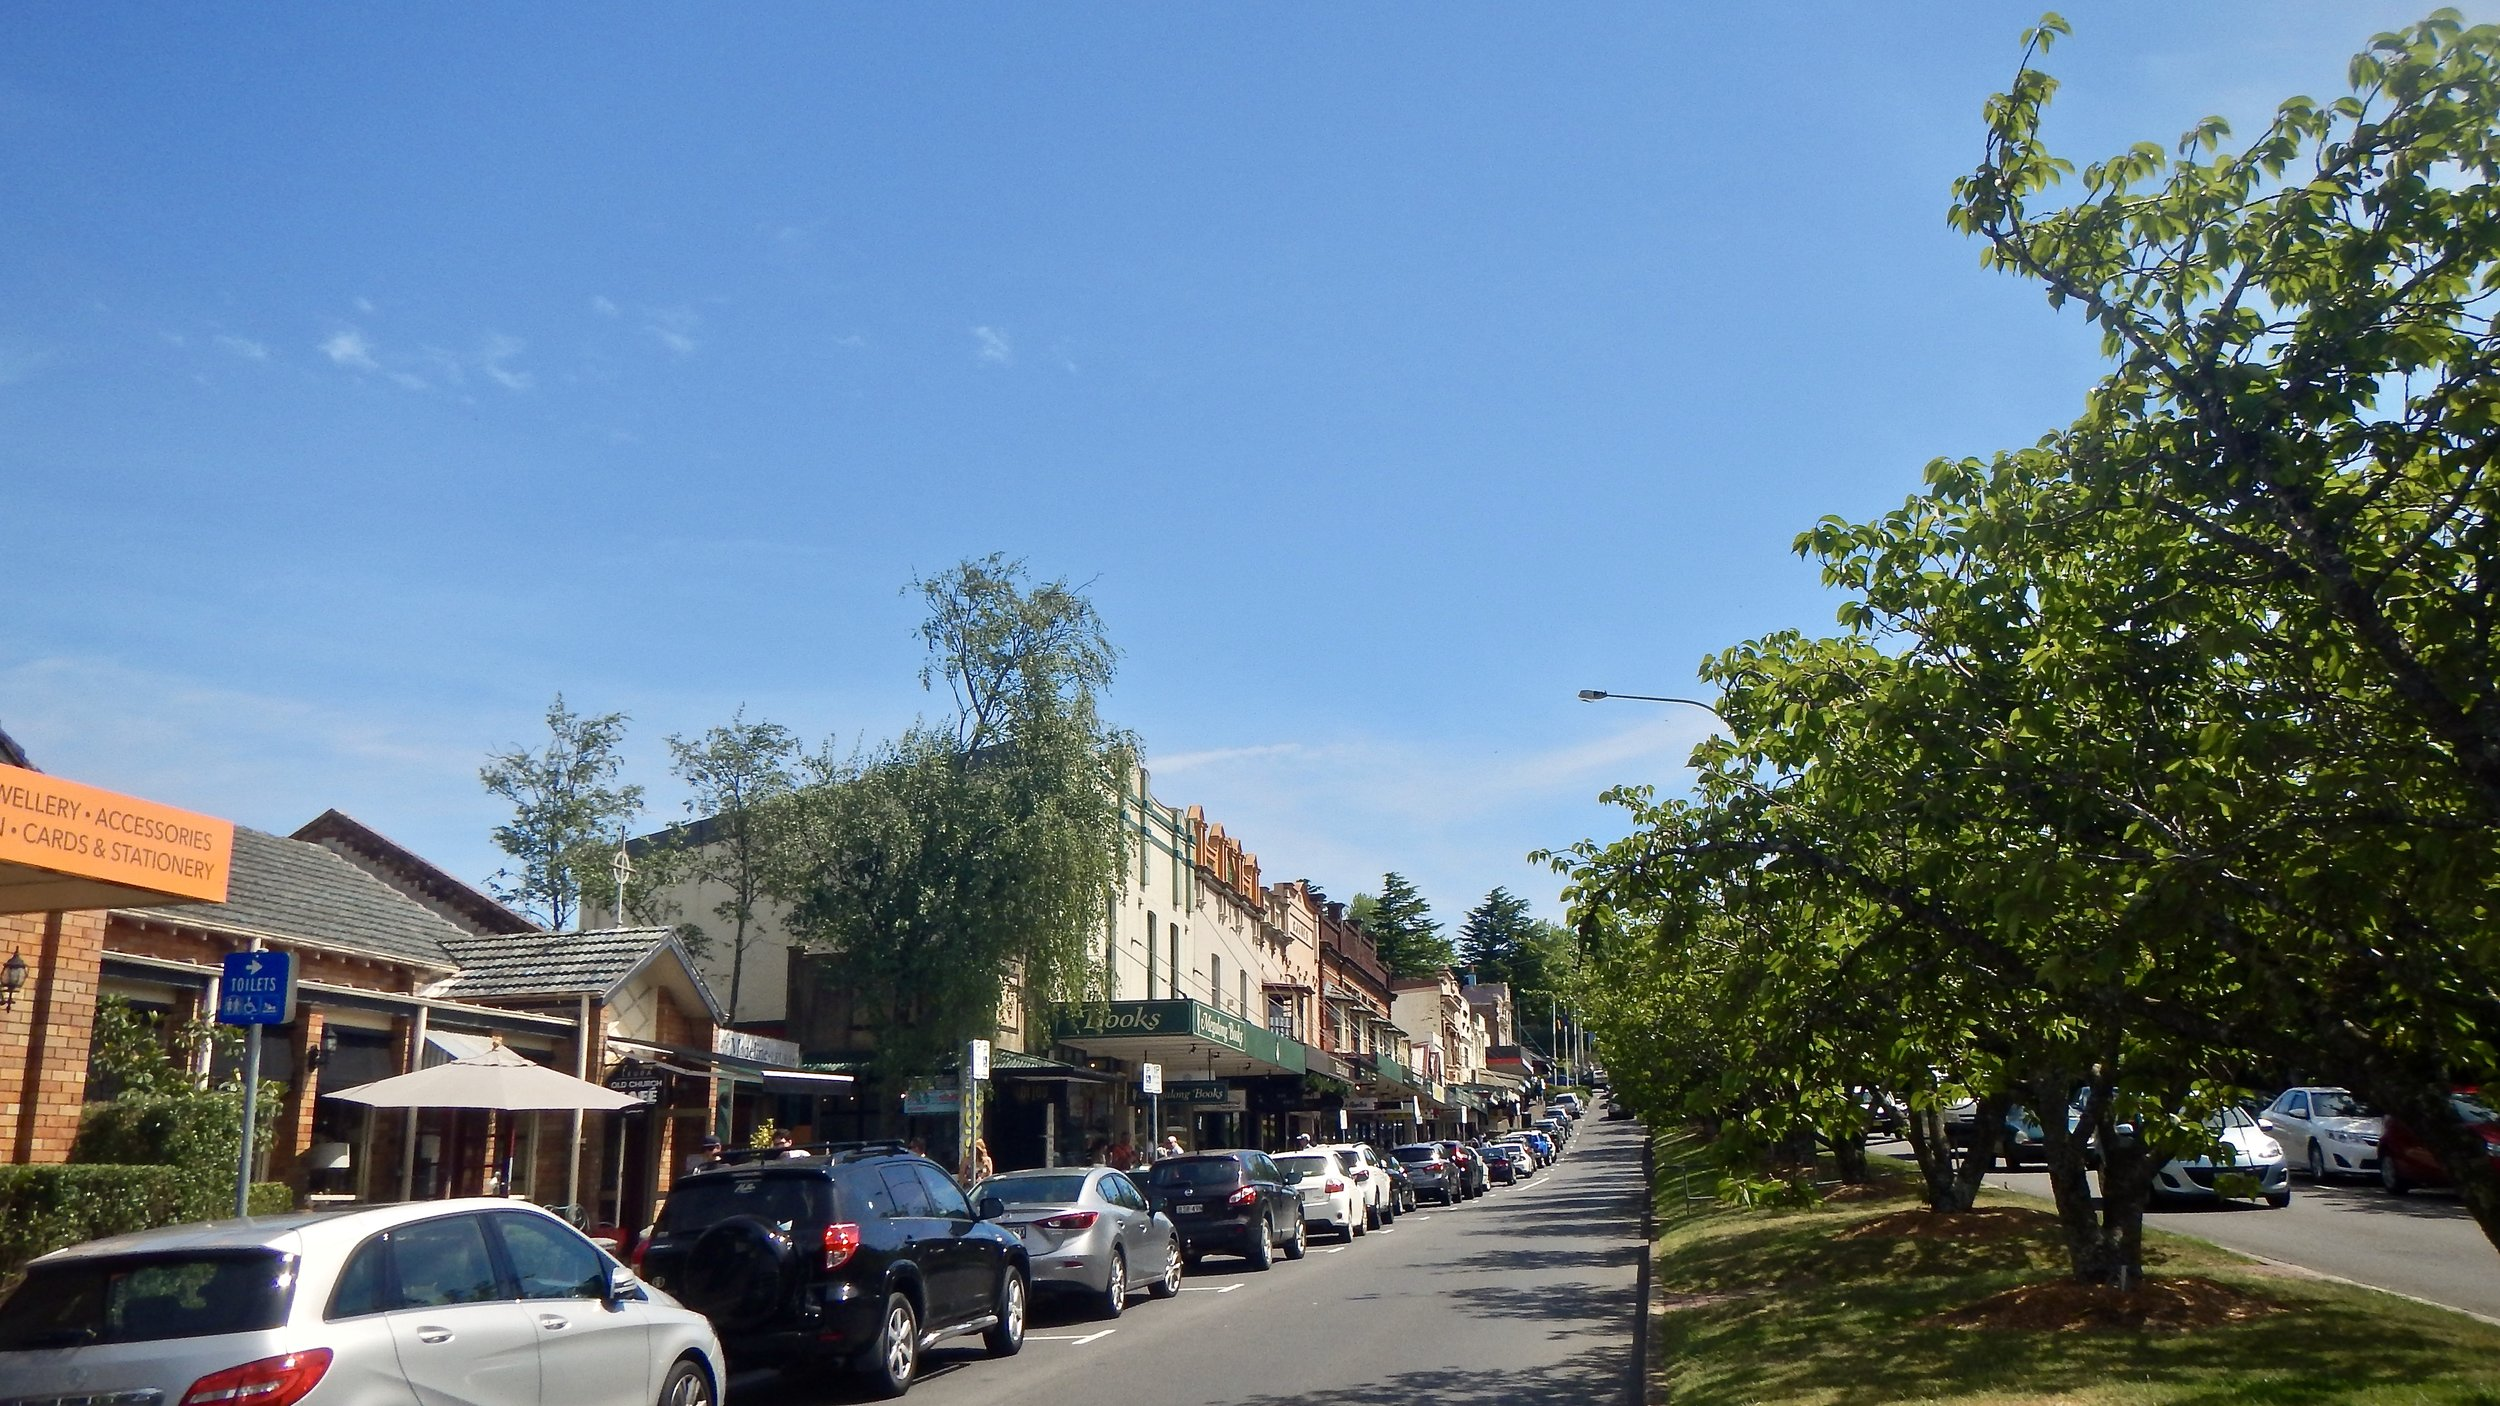 Leura high street, Blue Mountains, New South Wales